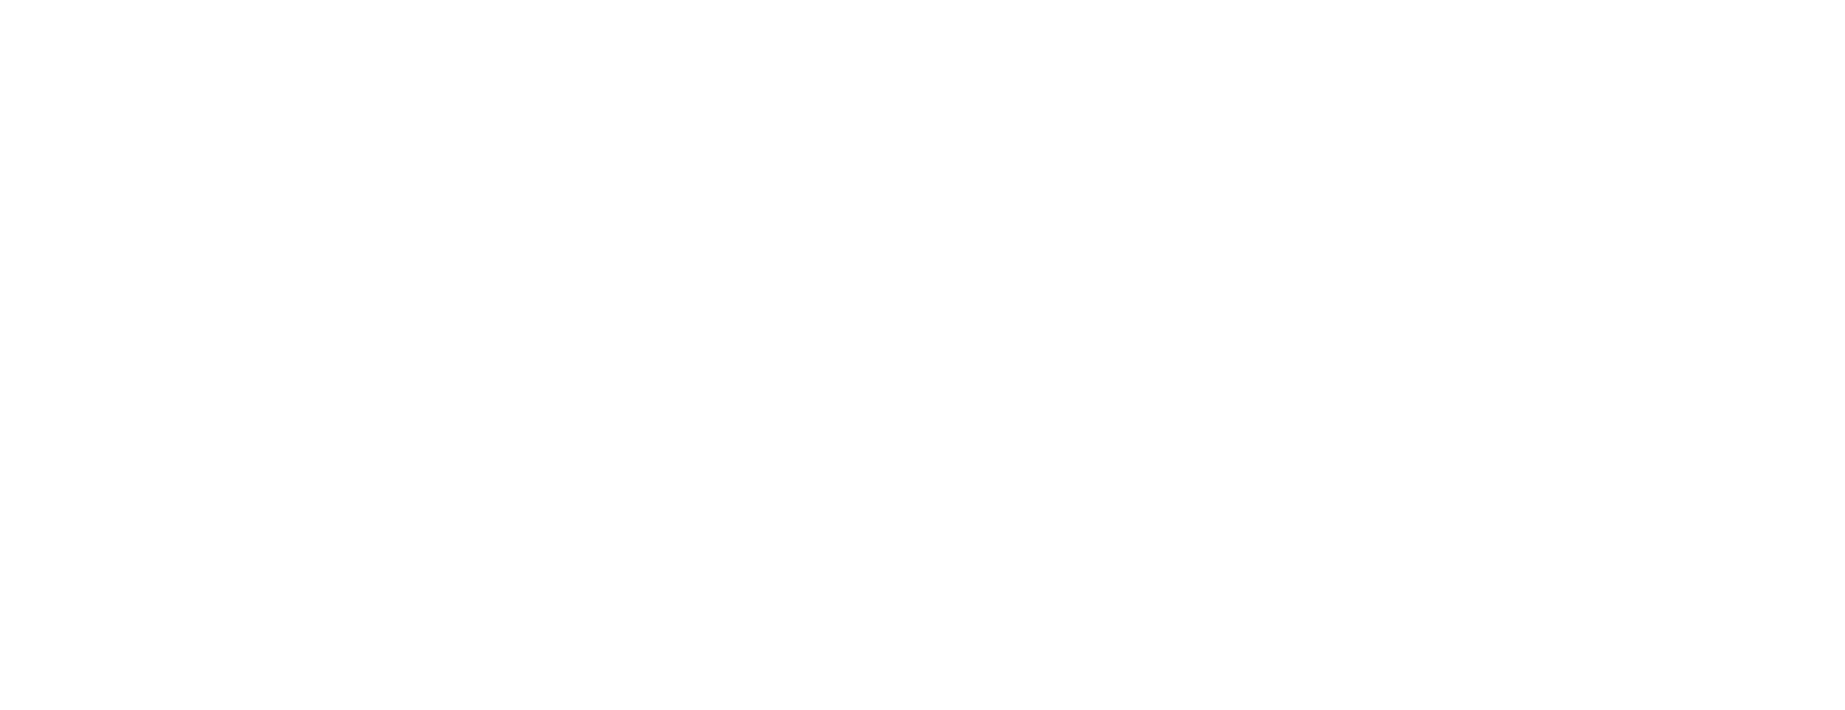 MAINFIRST AFFILIATED FUND MANAGERS (DEUTSCHLAND) GMBH